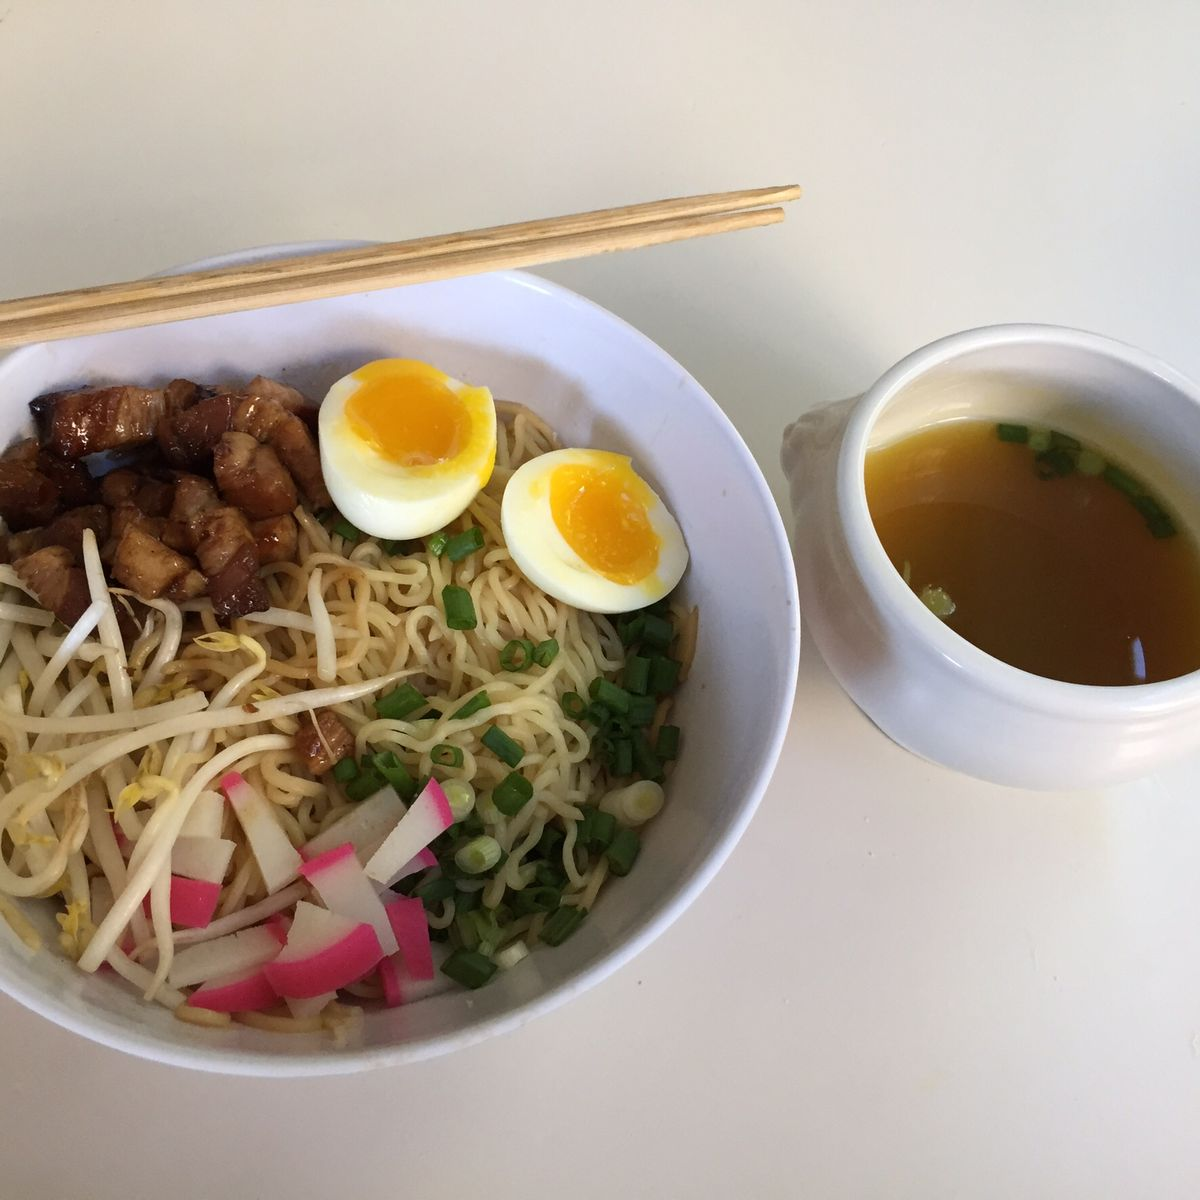 Hawaiian Style Dry Mein Noodles